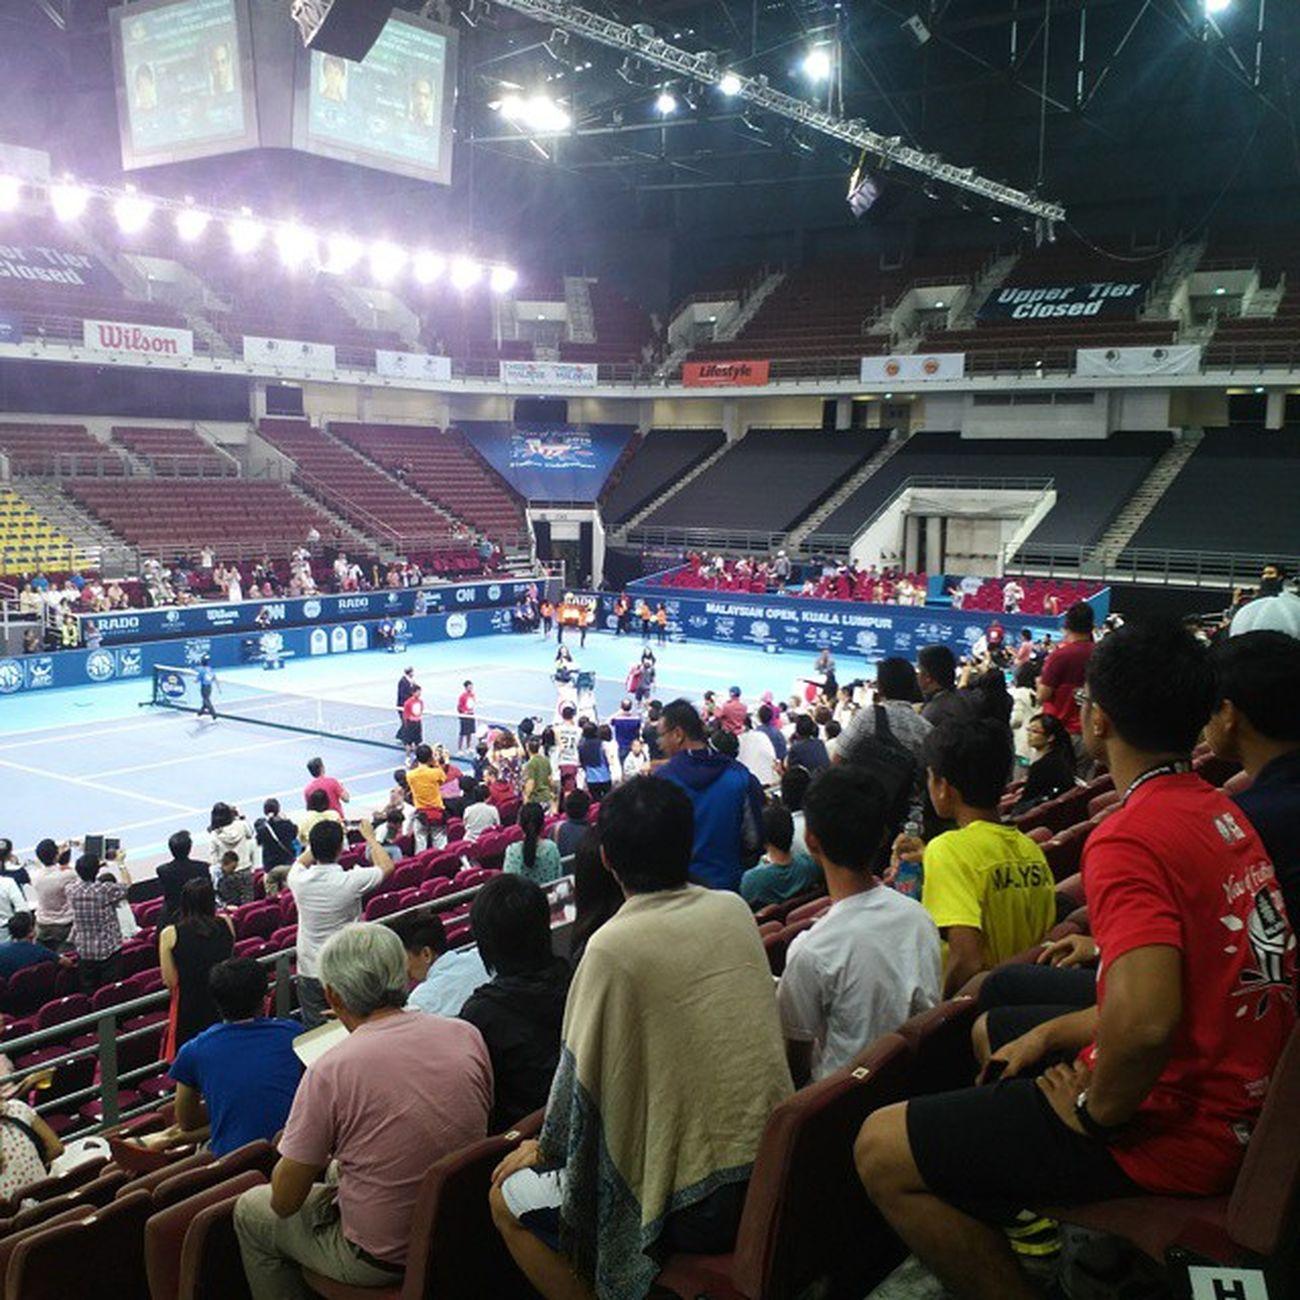 Yesterday's match featuring @keinishikori_official and Rajeev Ram @malaysianopentennis Tennis Kualalumpur Iamalexchan Malaysia million mokl2014 malaysianopentennis atp